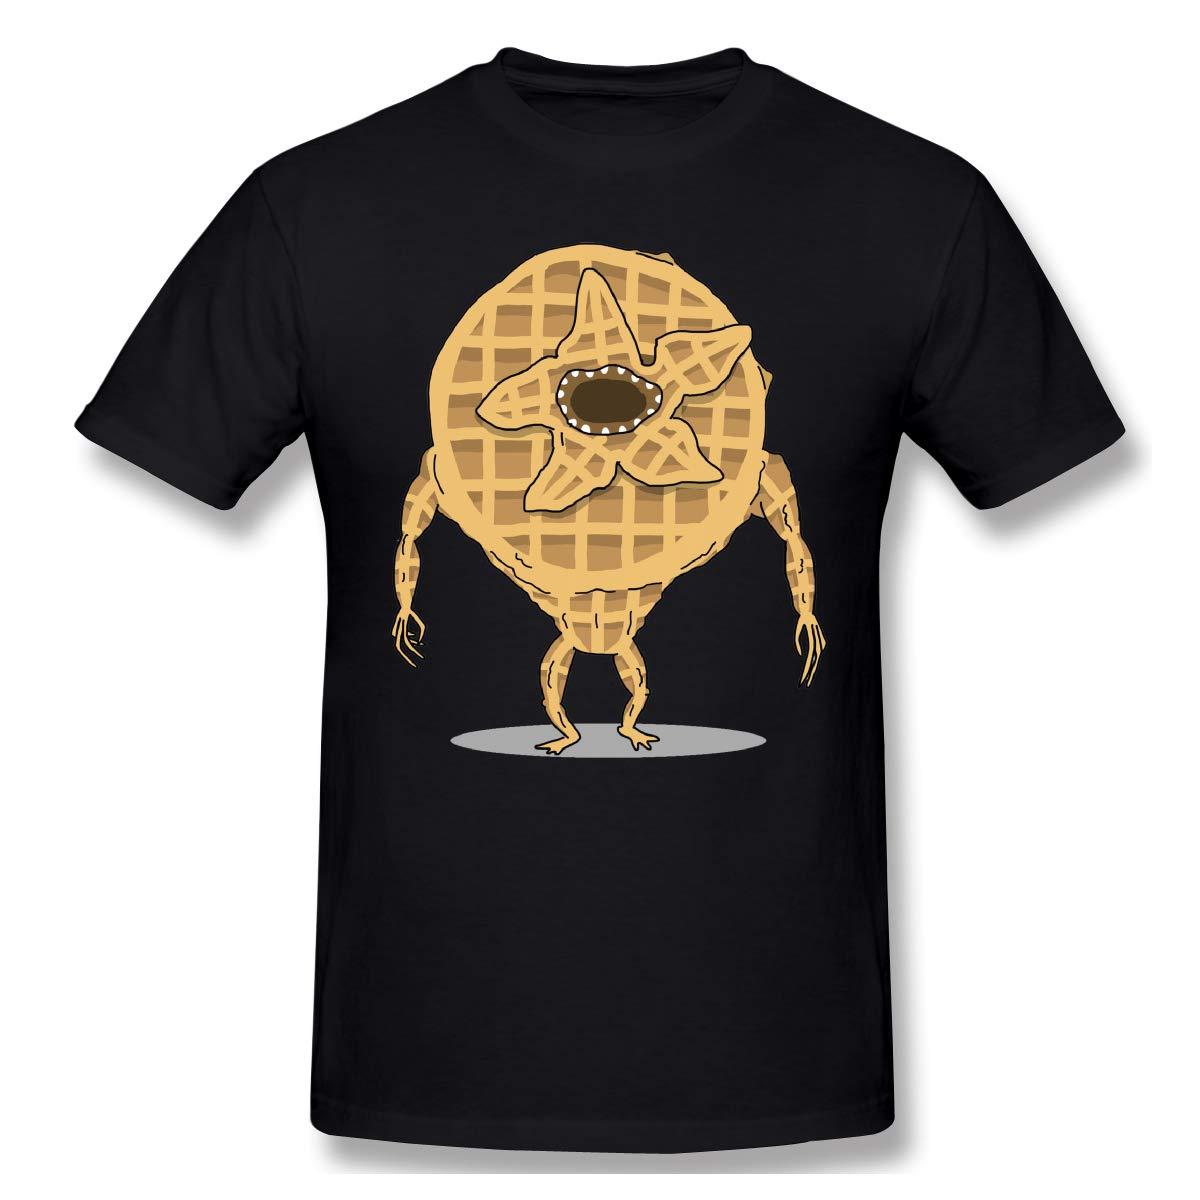 Gallagher Waffles Demogorgon Casual T Shirt Short Sleeve Tee For